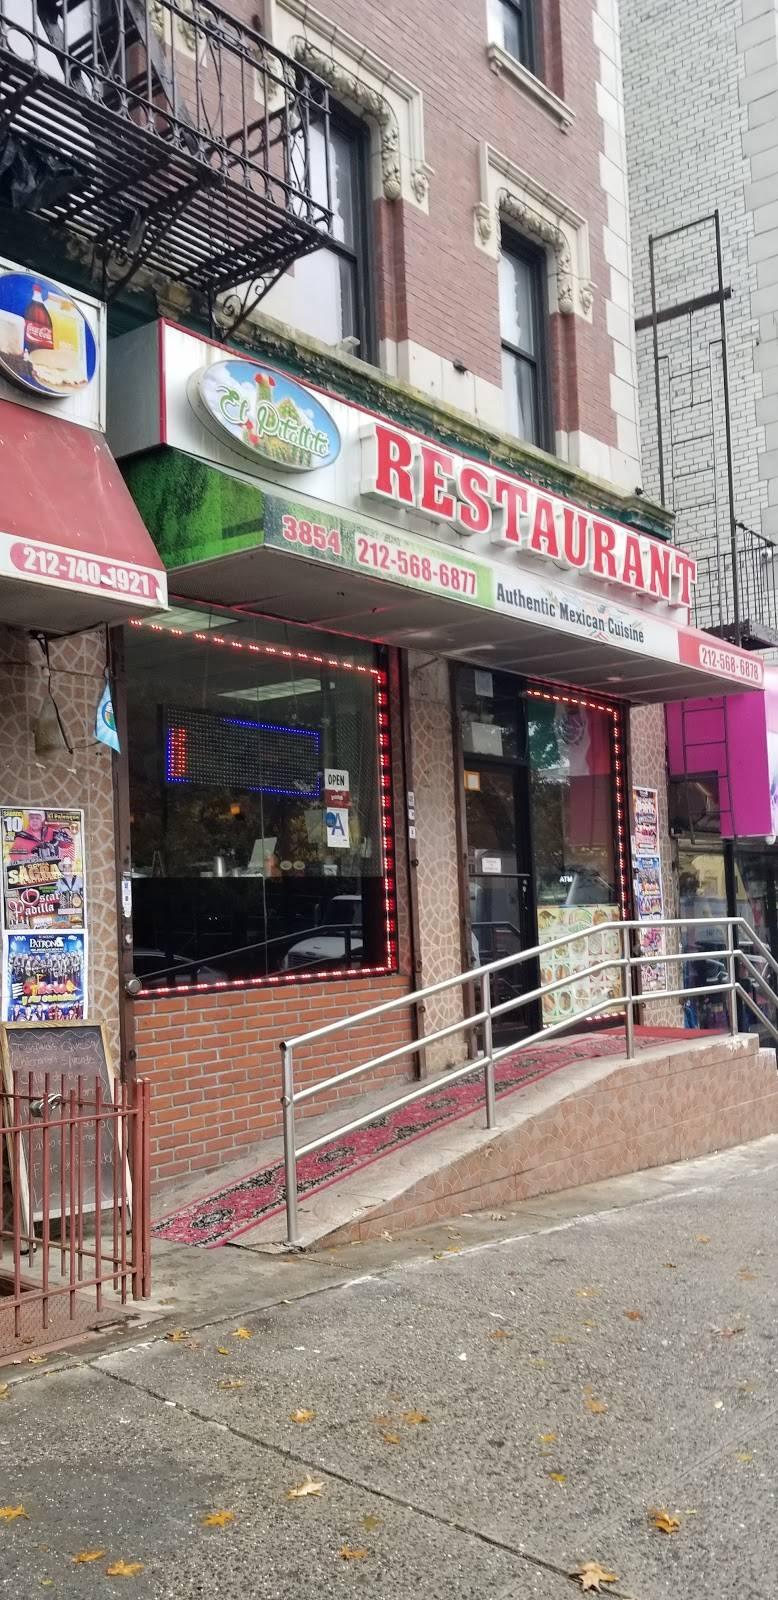 El Pitallito | restaurant | 3854 Broadway, New York, NY 10032, USA | 2125686877 OR +1 212-568-6877